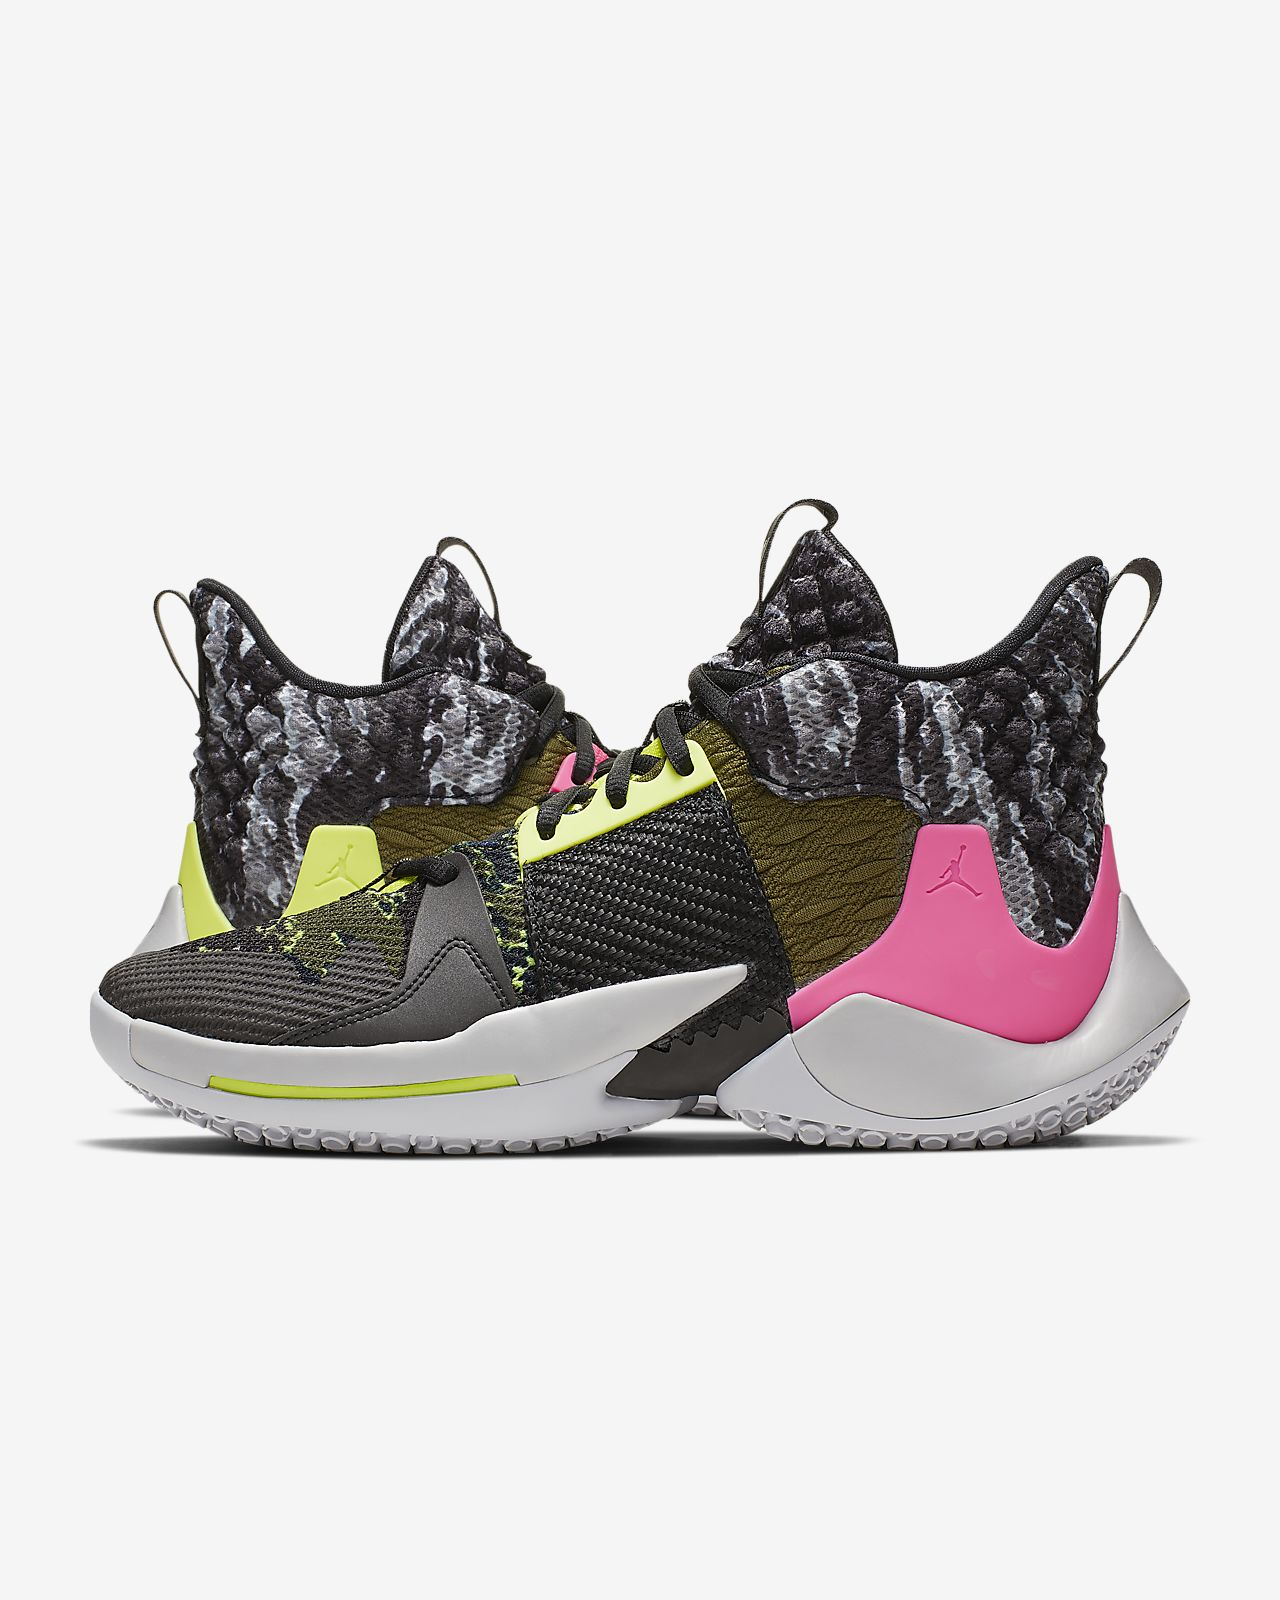 Jordan Why Not Zer0.2 PF男子篮球鞋